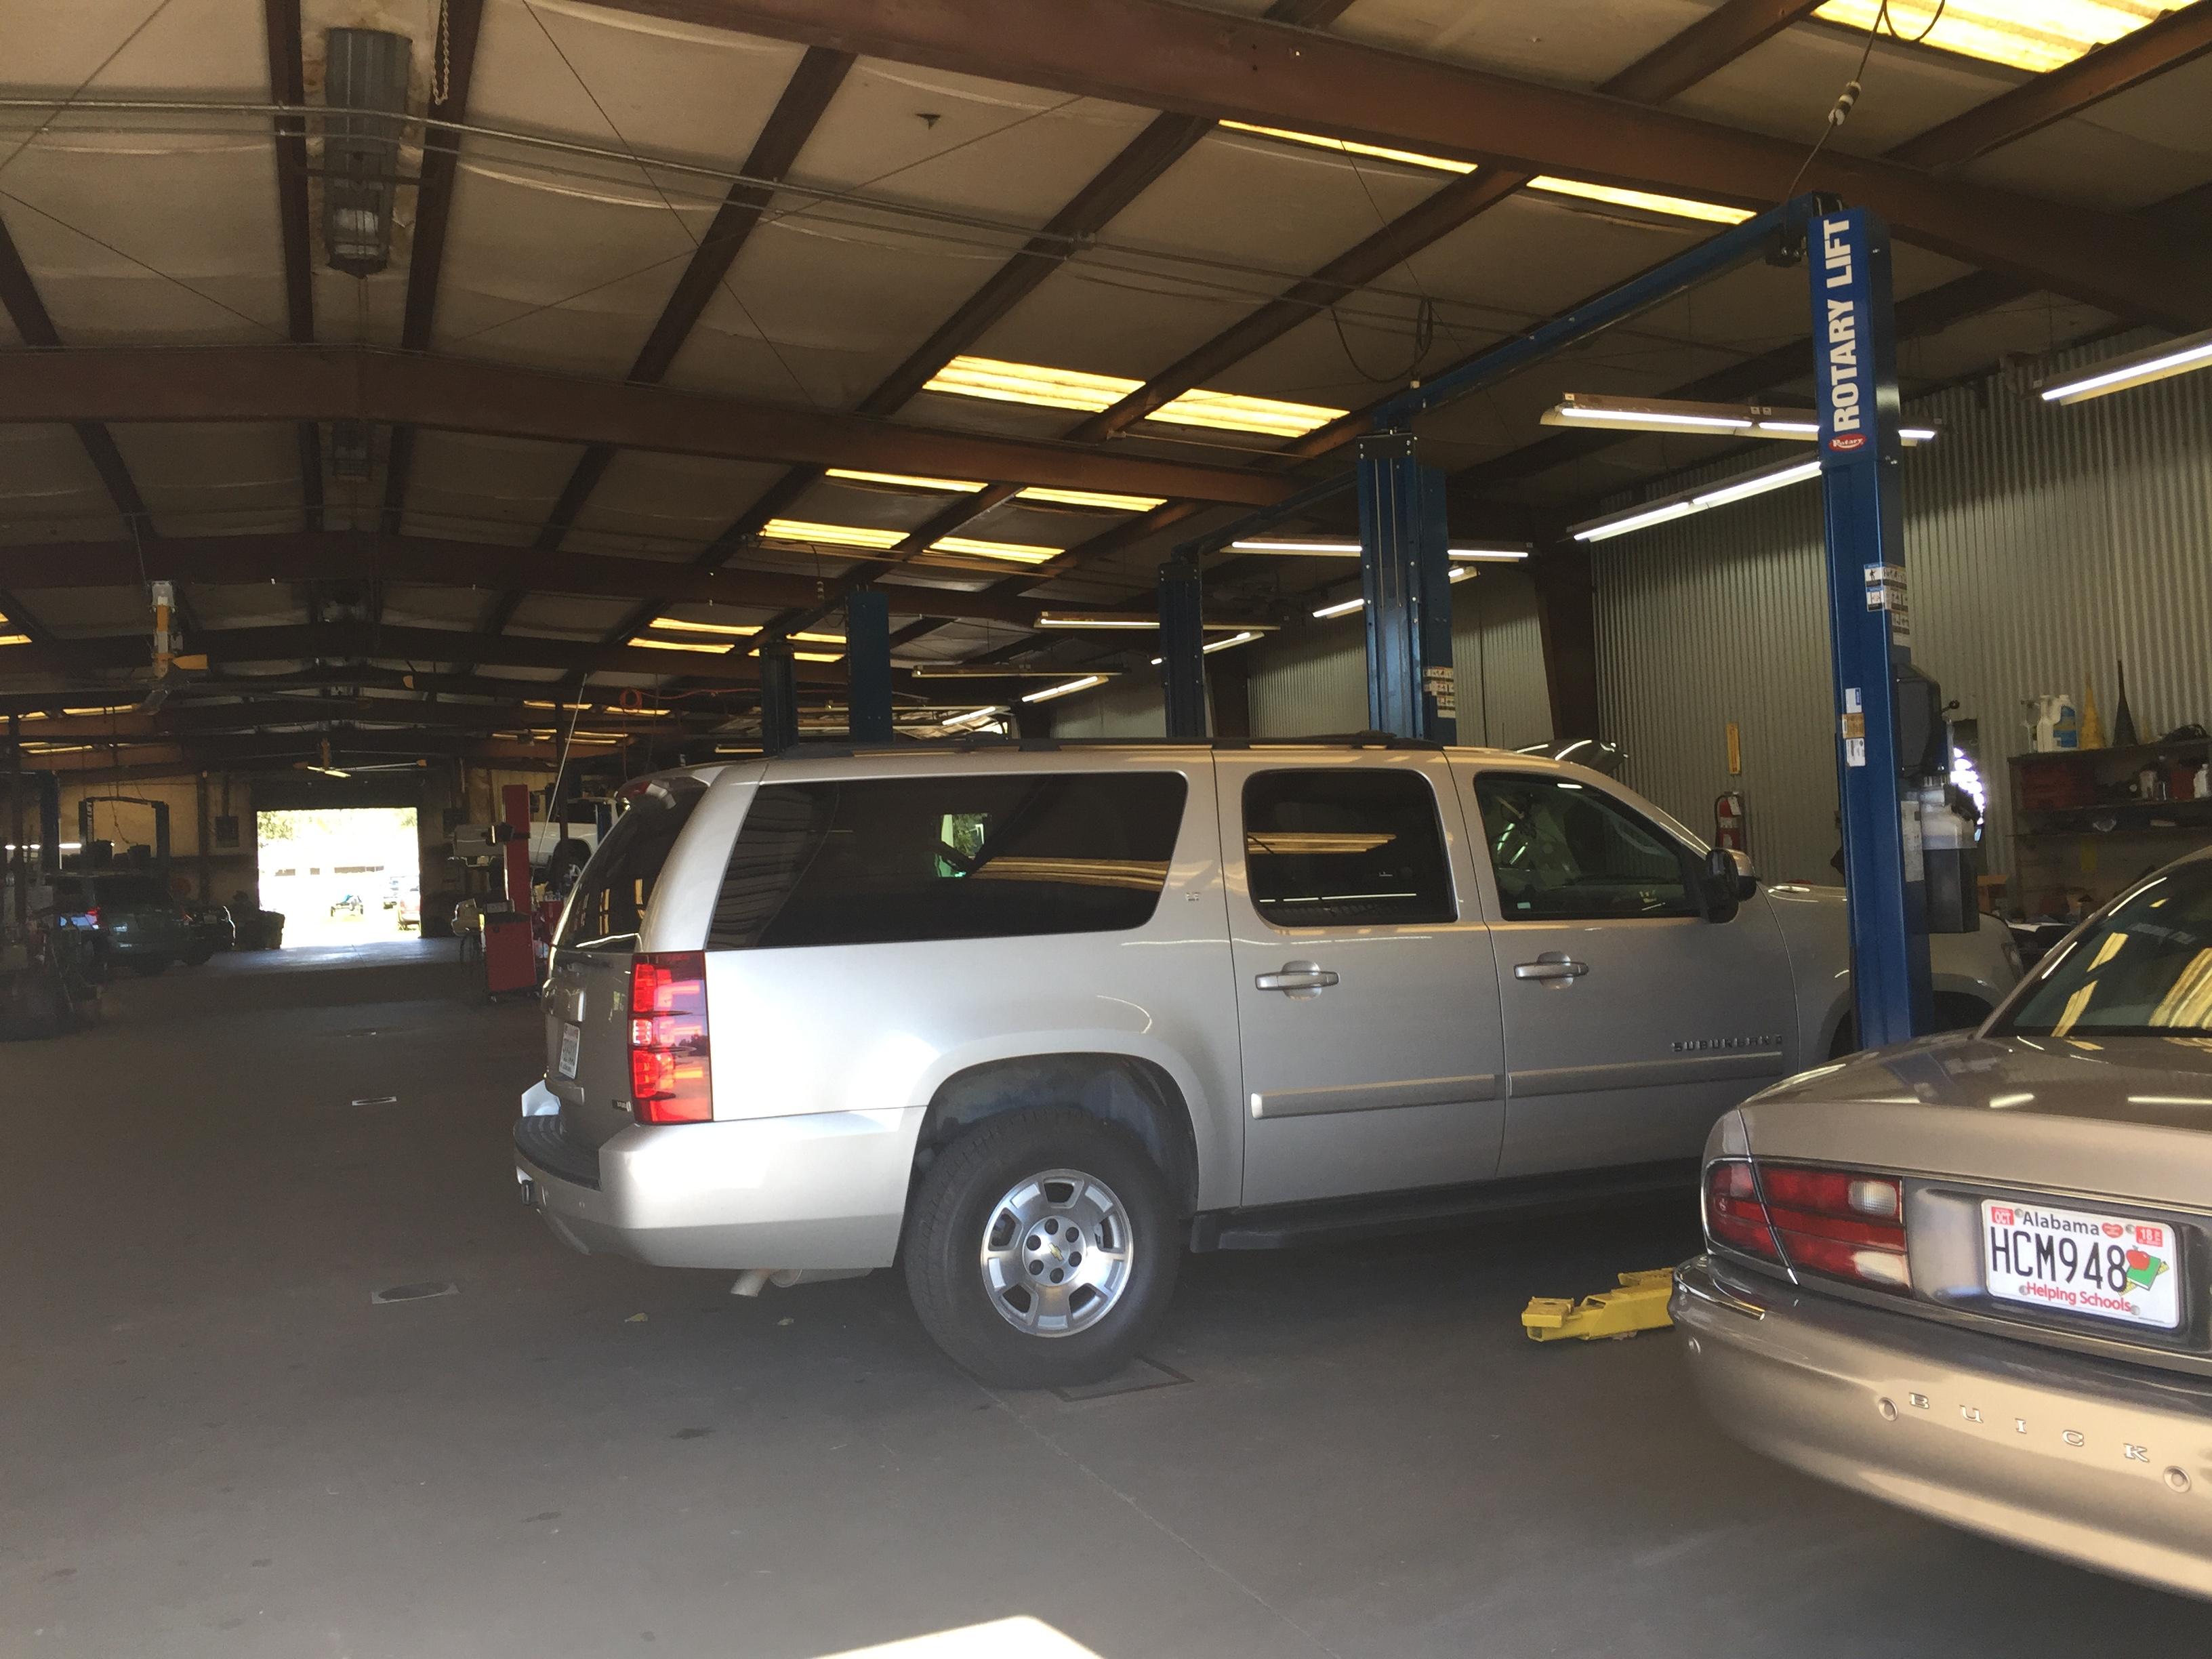 Haigler Auto Services image 4